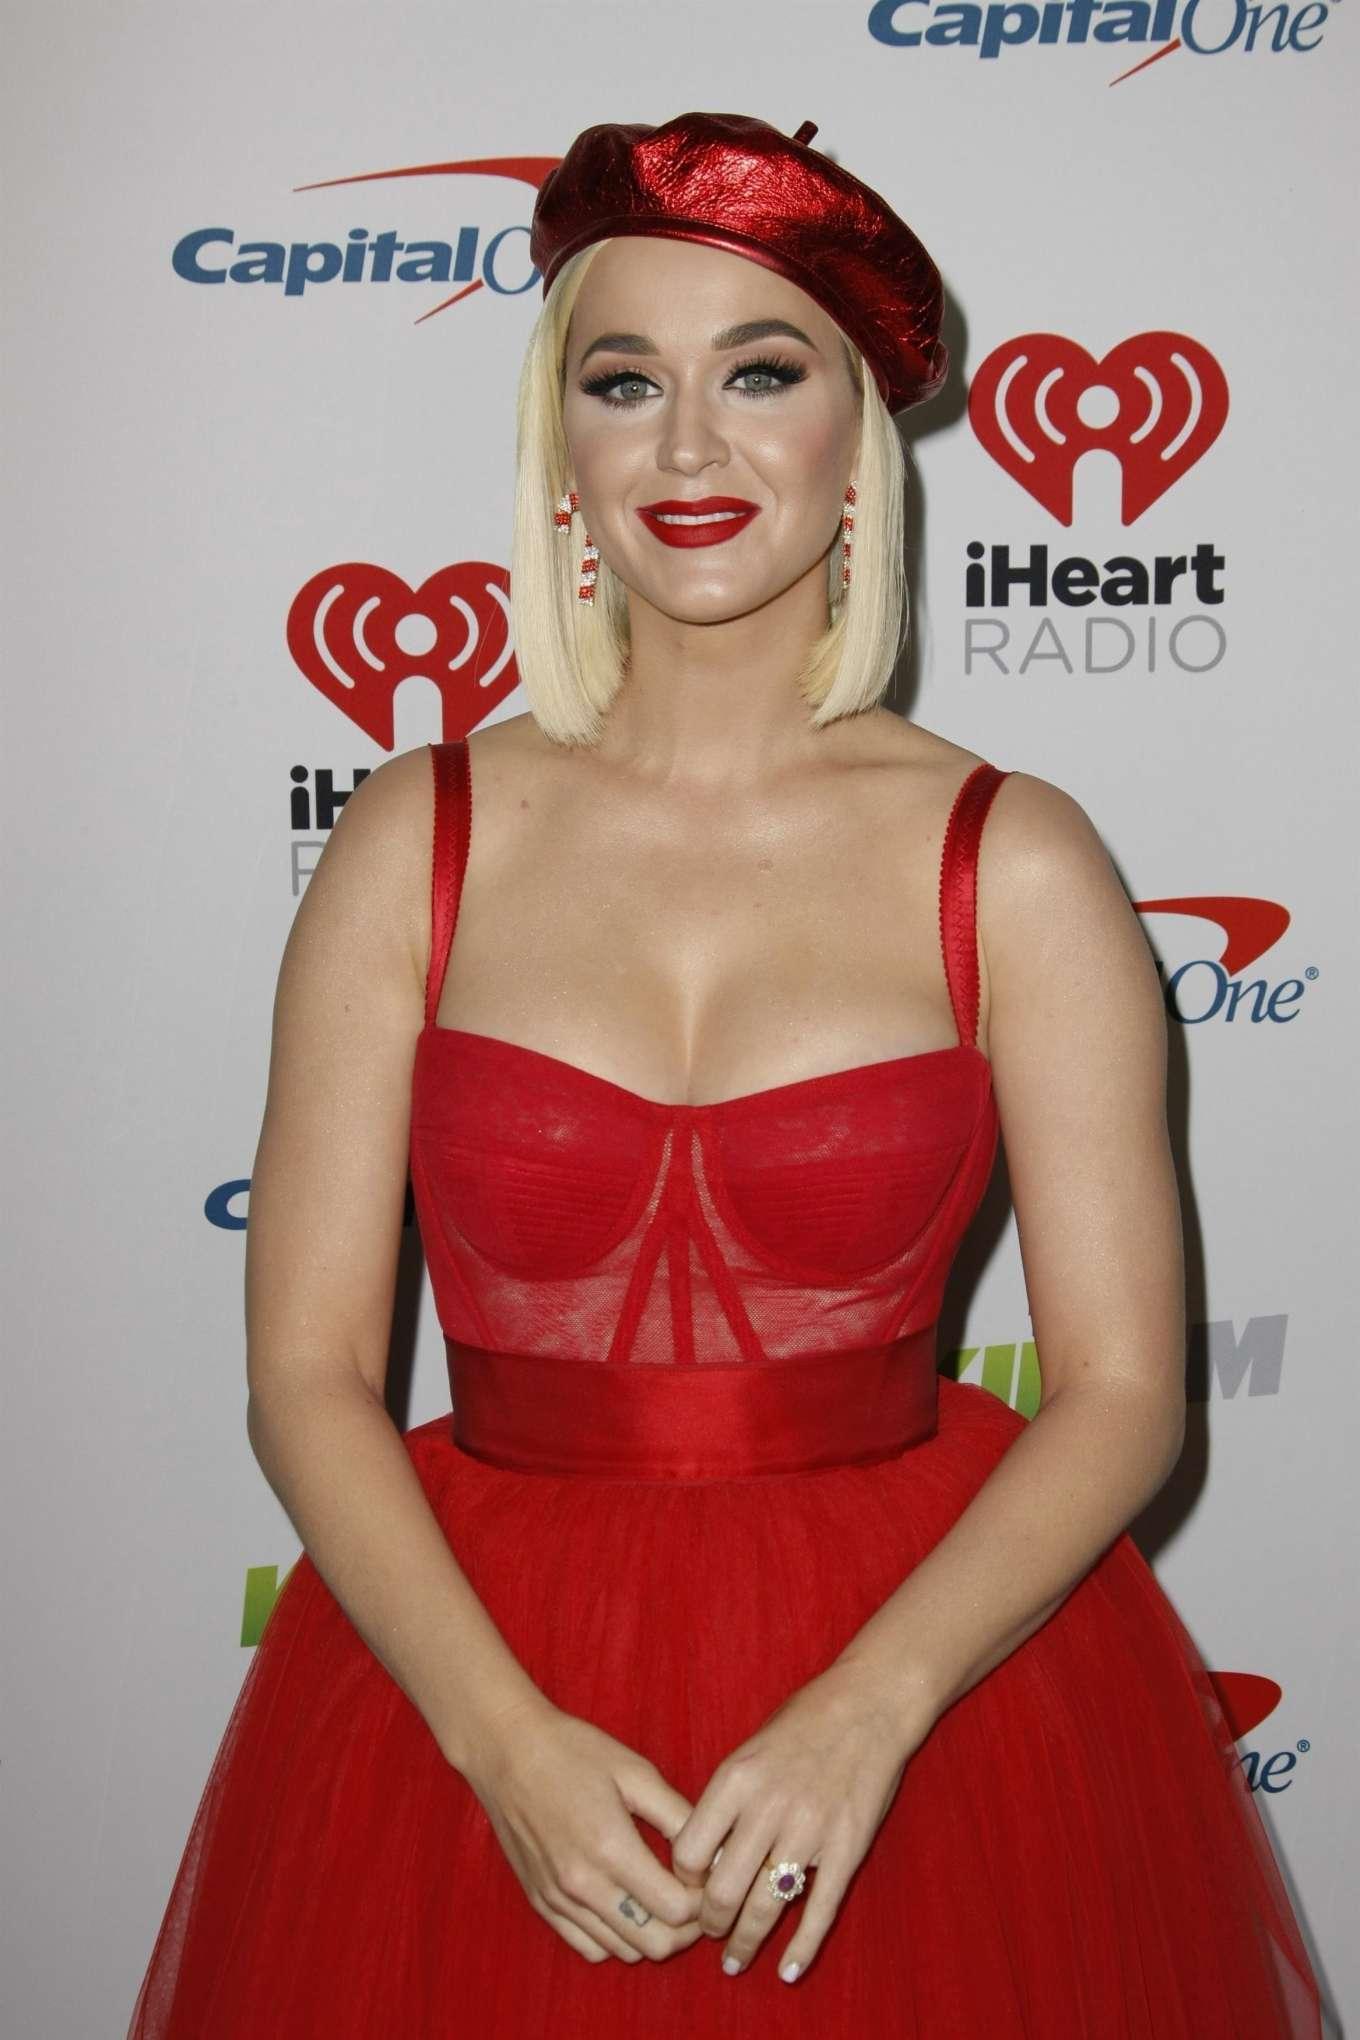 Katy Perry 2019 : Katy Perry – 2019 KIIS FMs iHeartRadio Jingle Ball-22